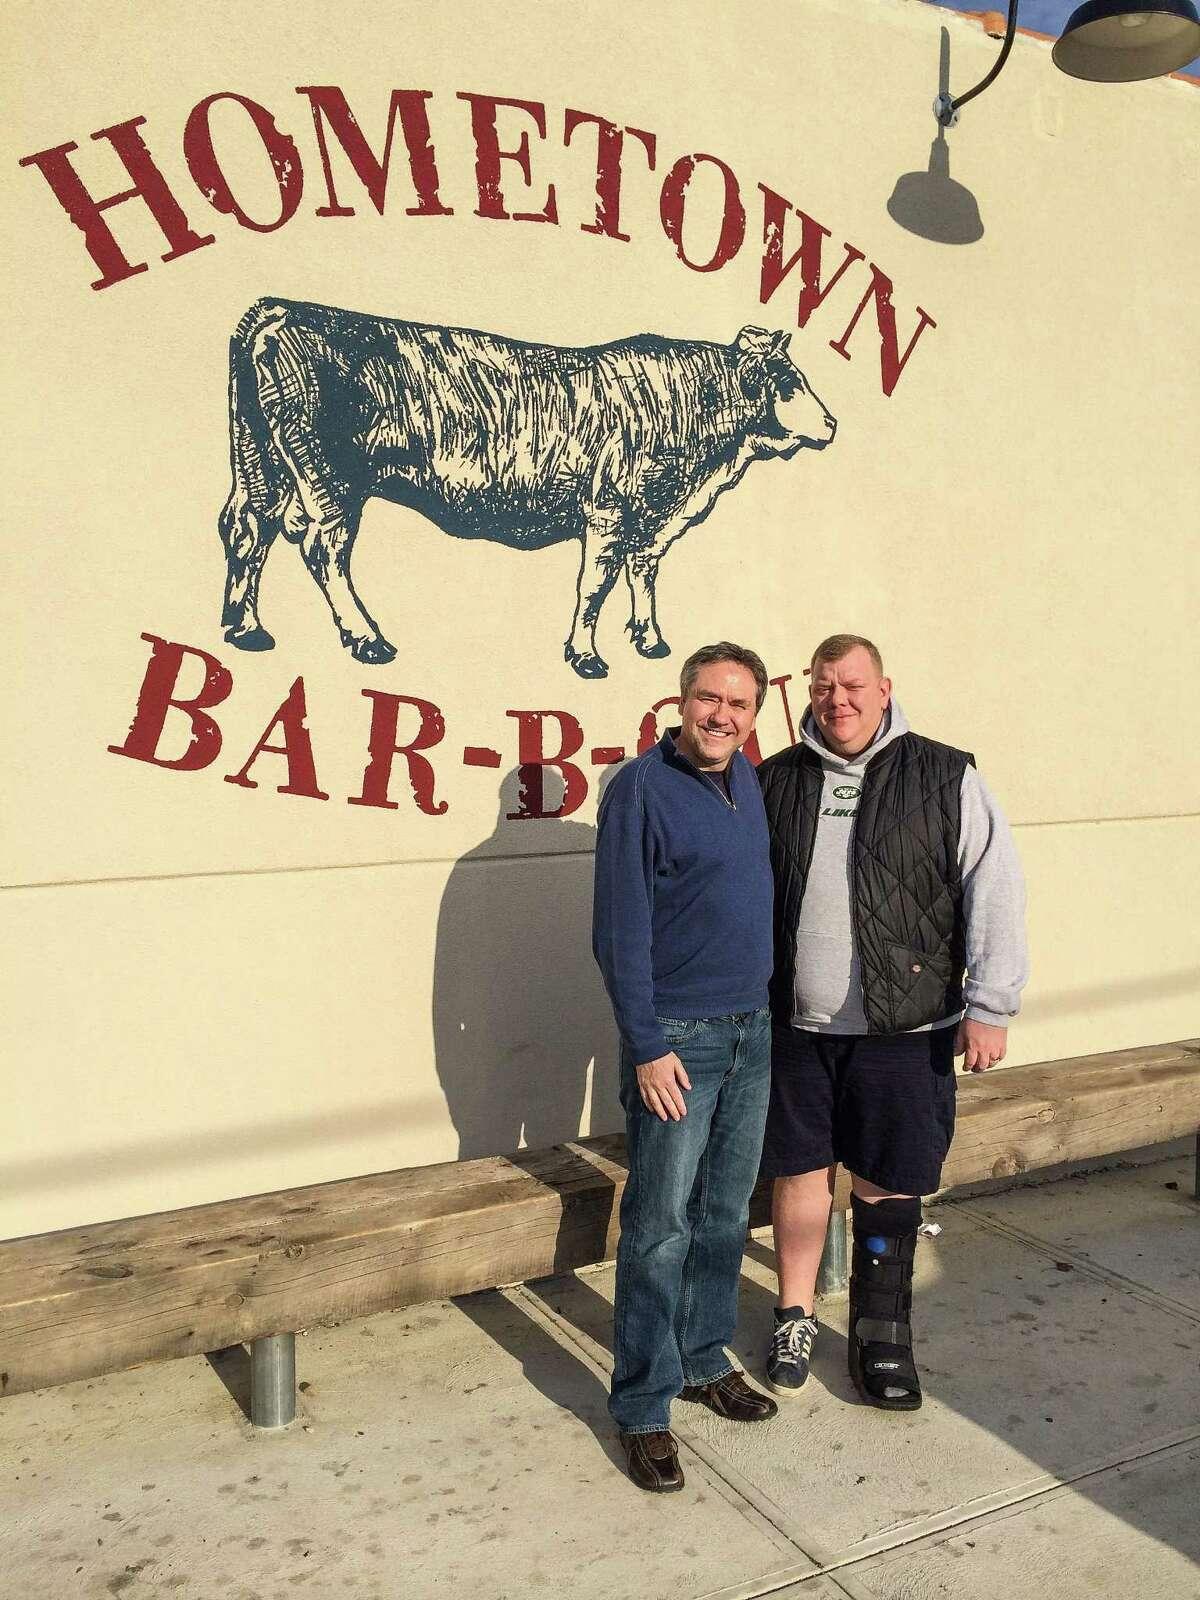 J.C. Reid and Billy Durneyat Hometown Bar-B-Que in Brooklyn, N.Y.